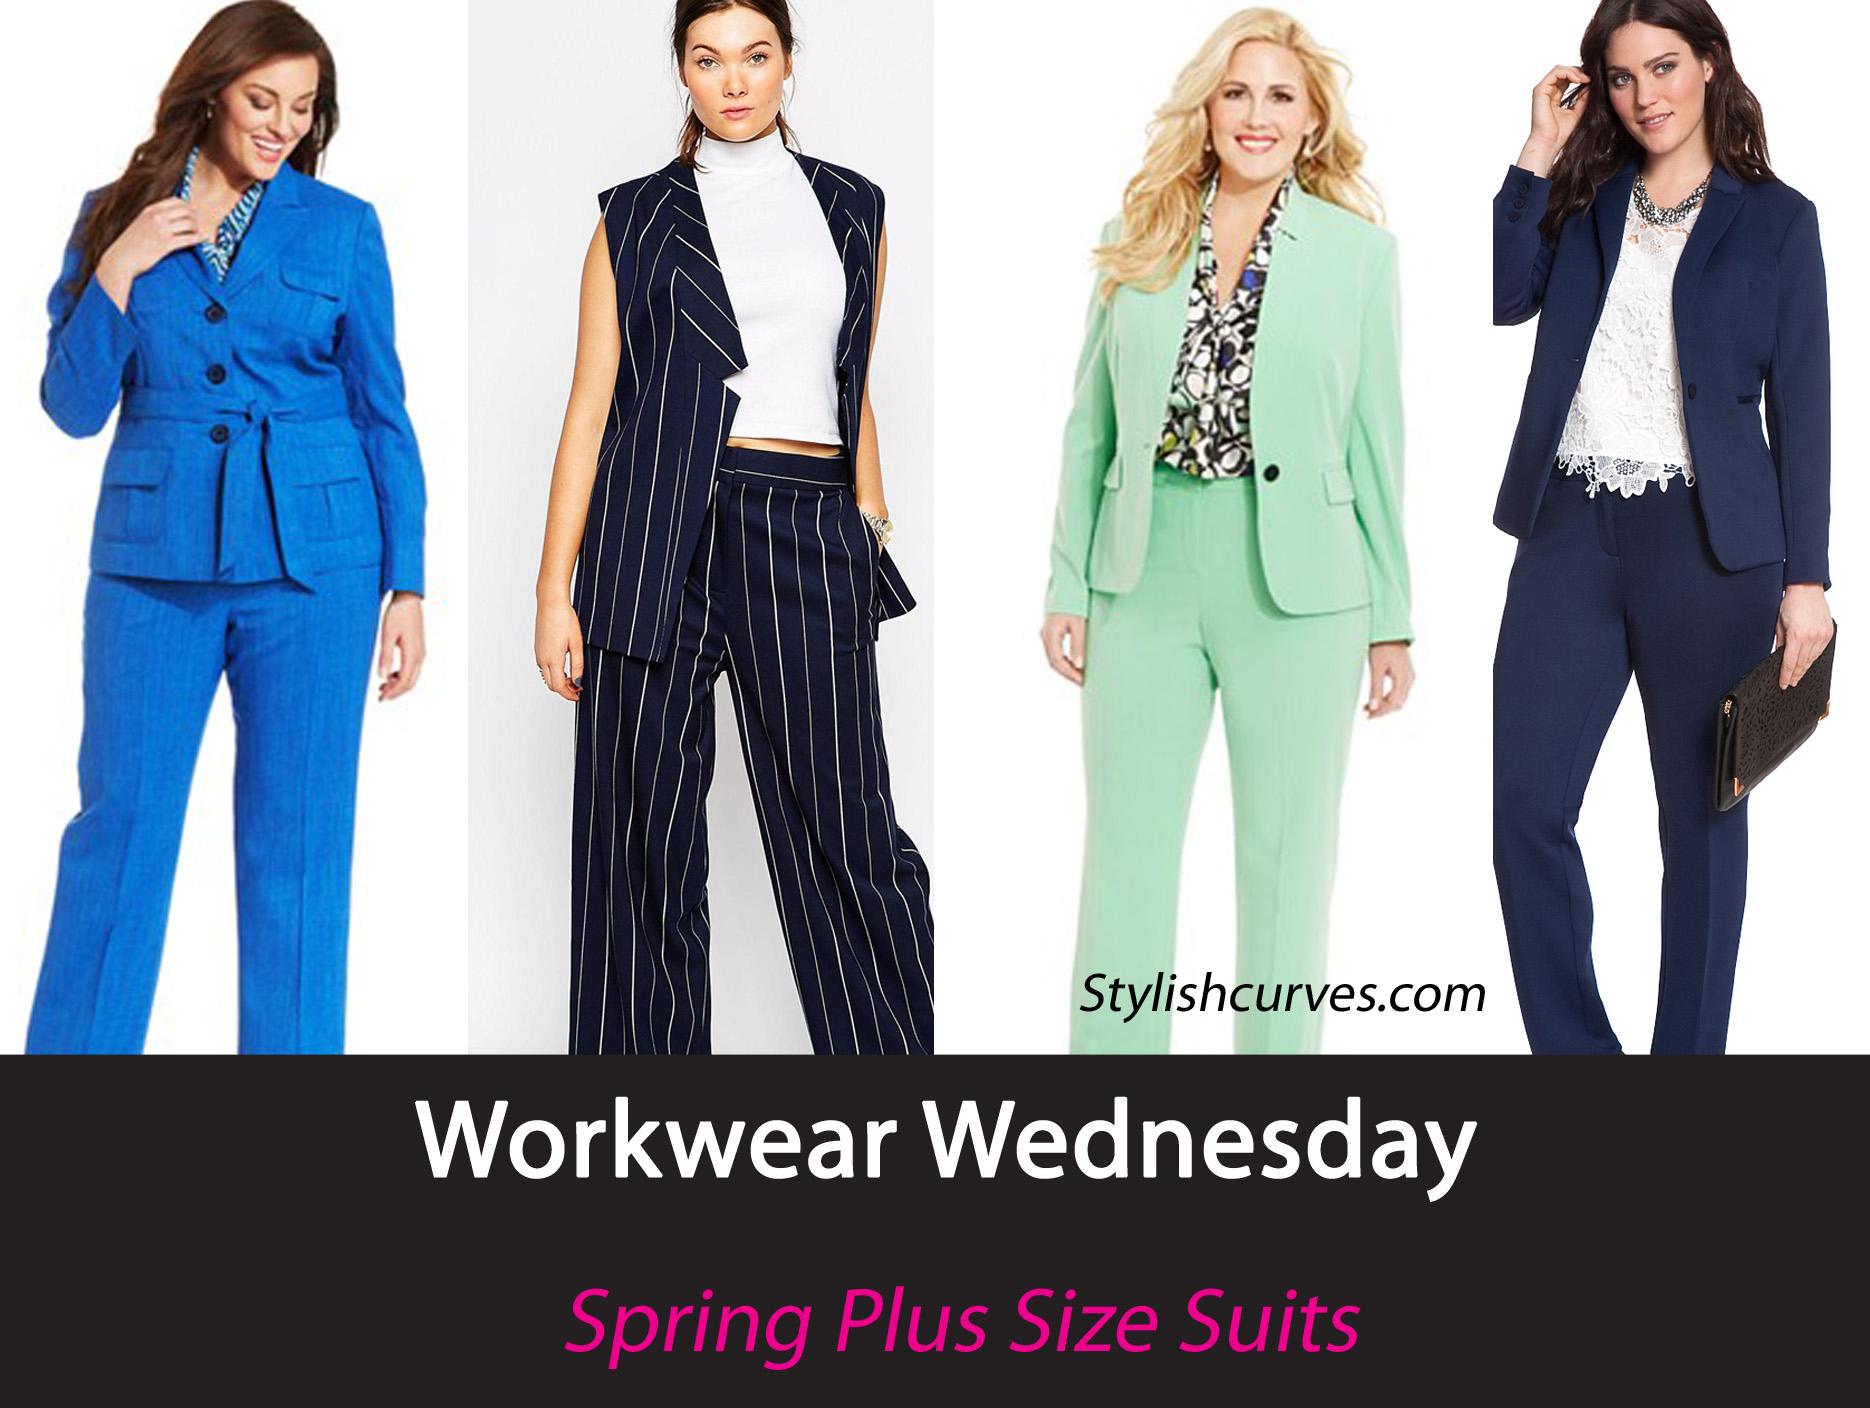 spring plus size suits